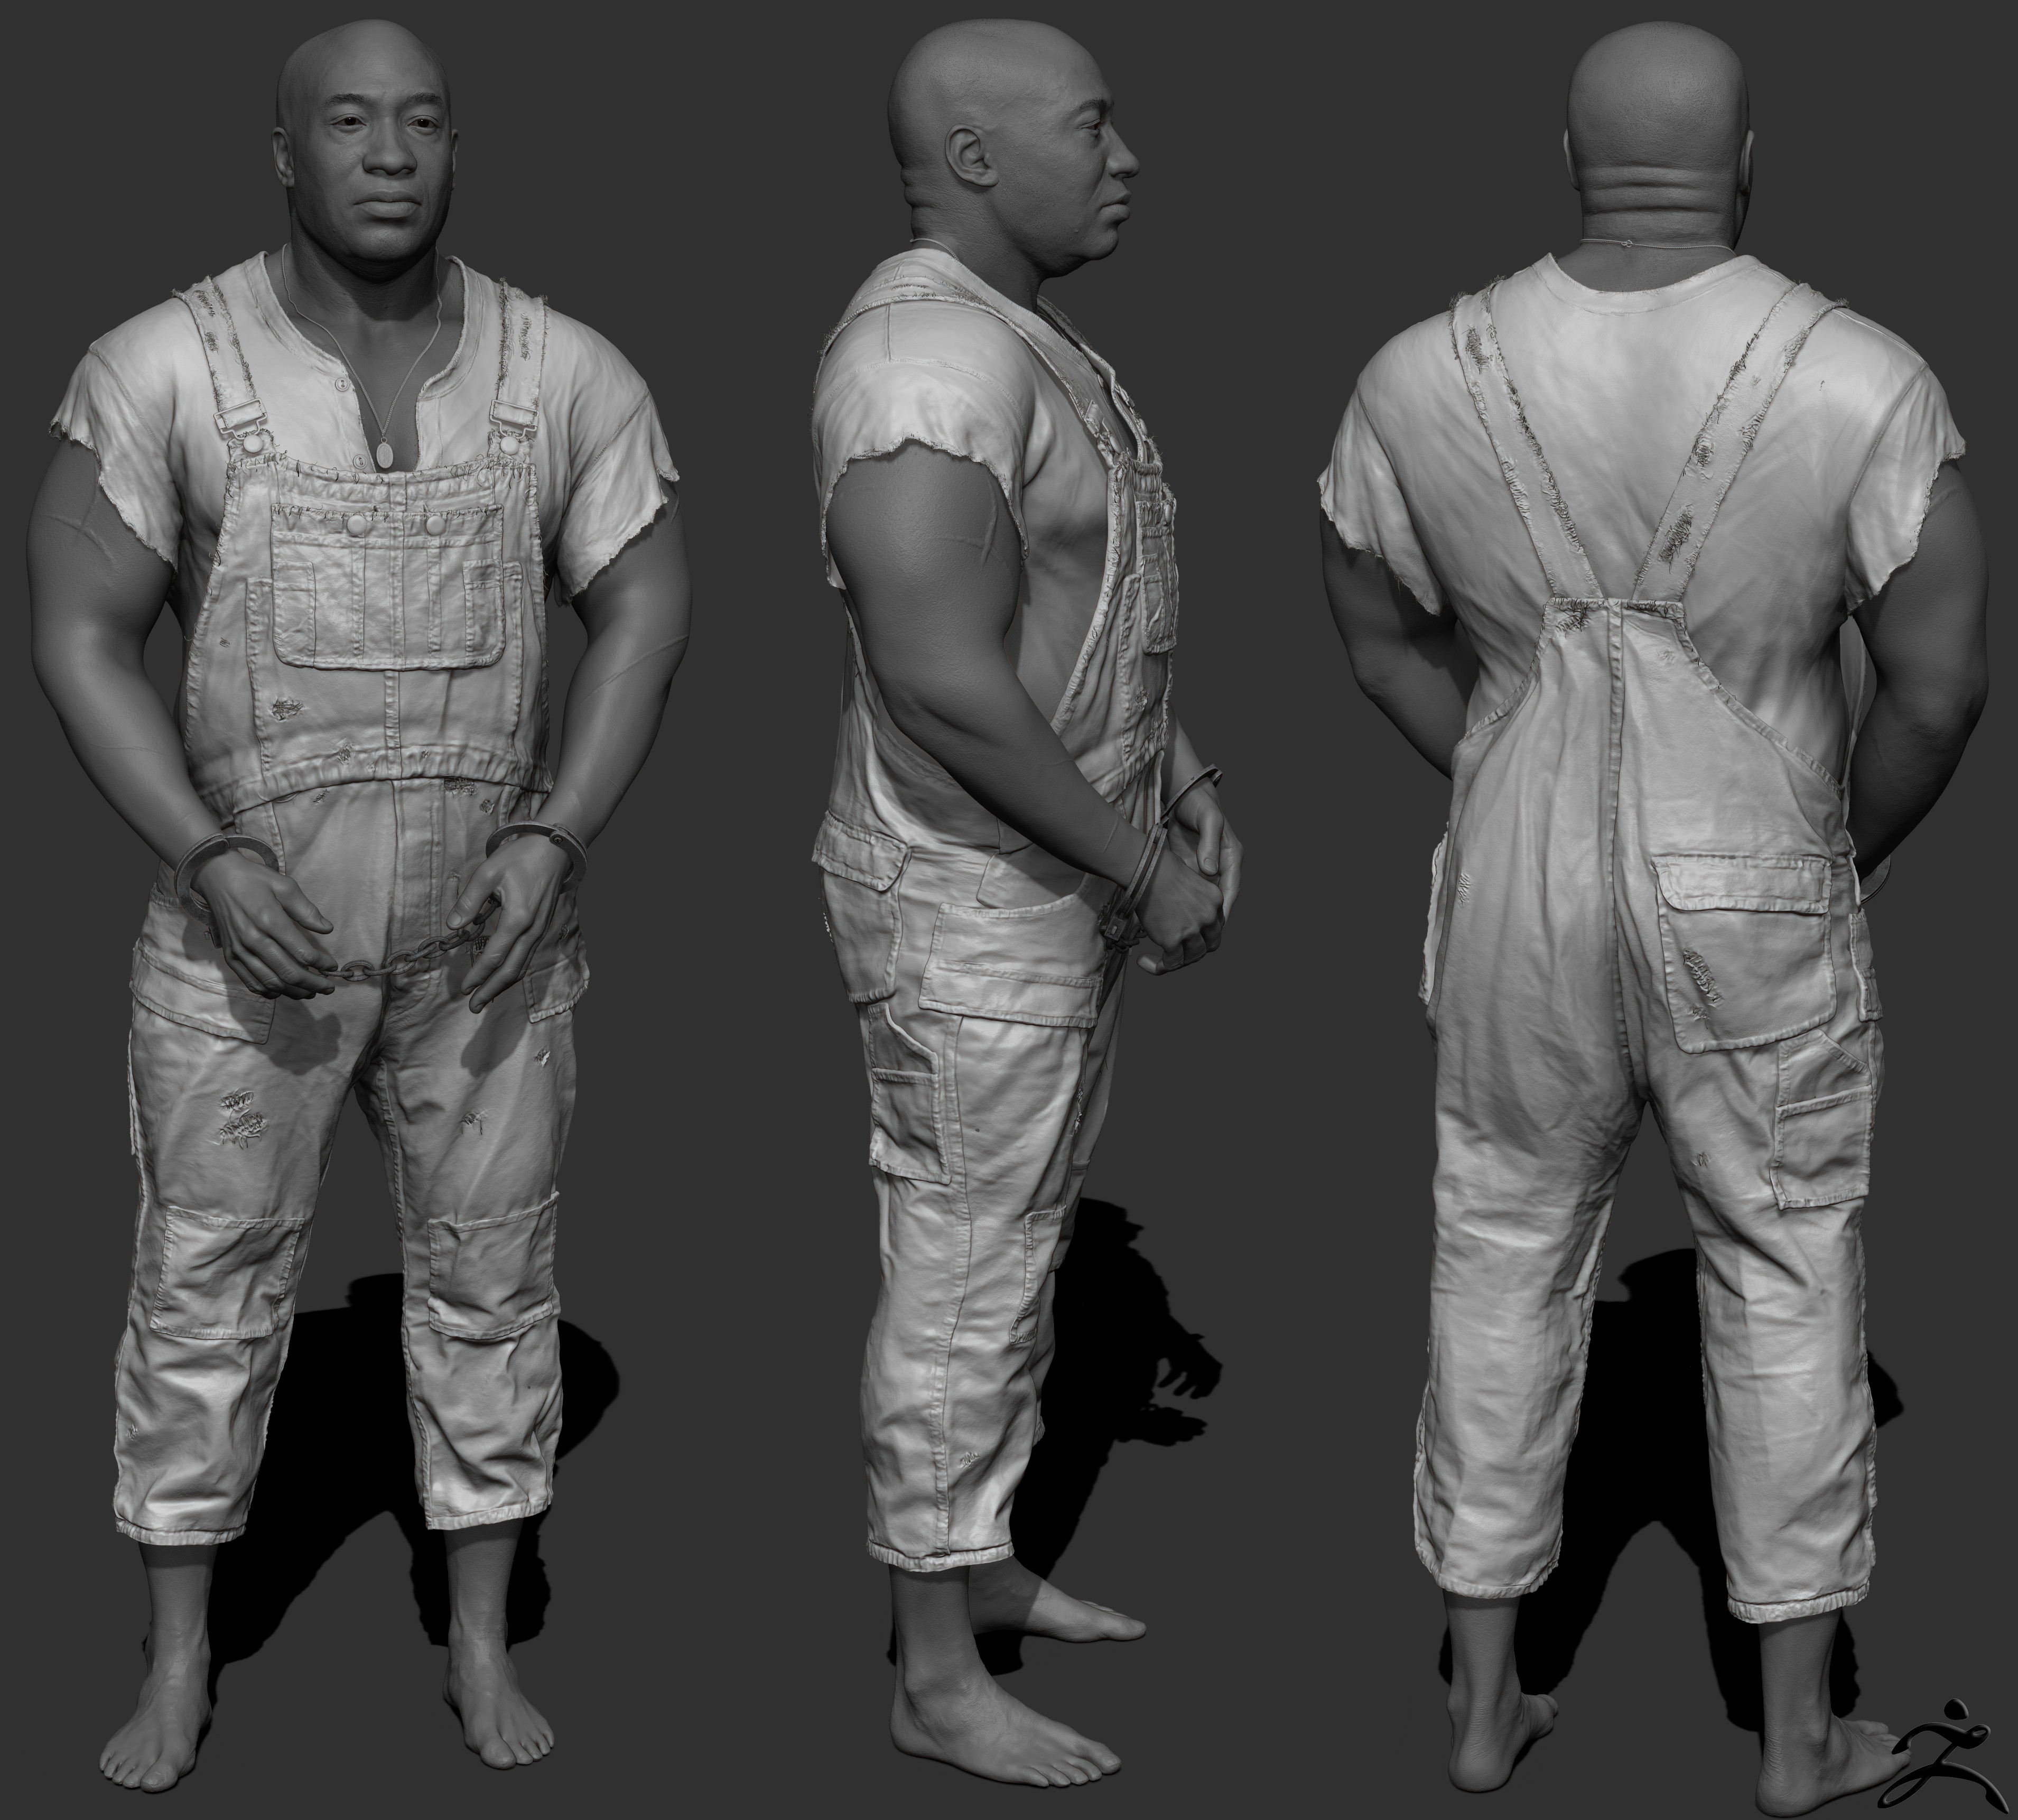 Zbrush Sculpt Body: Quick Render